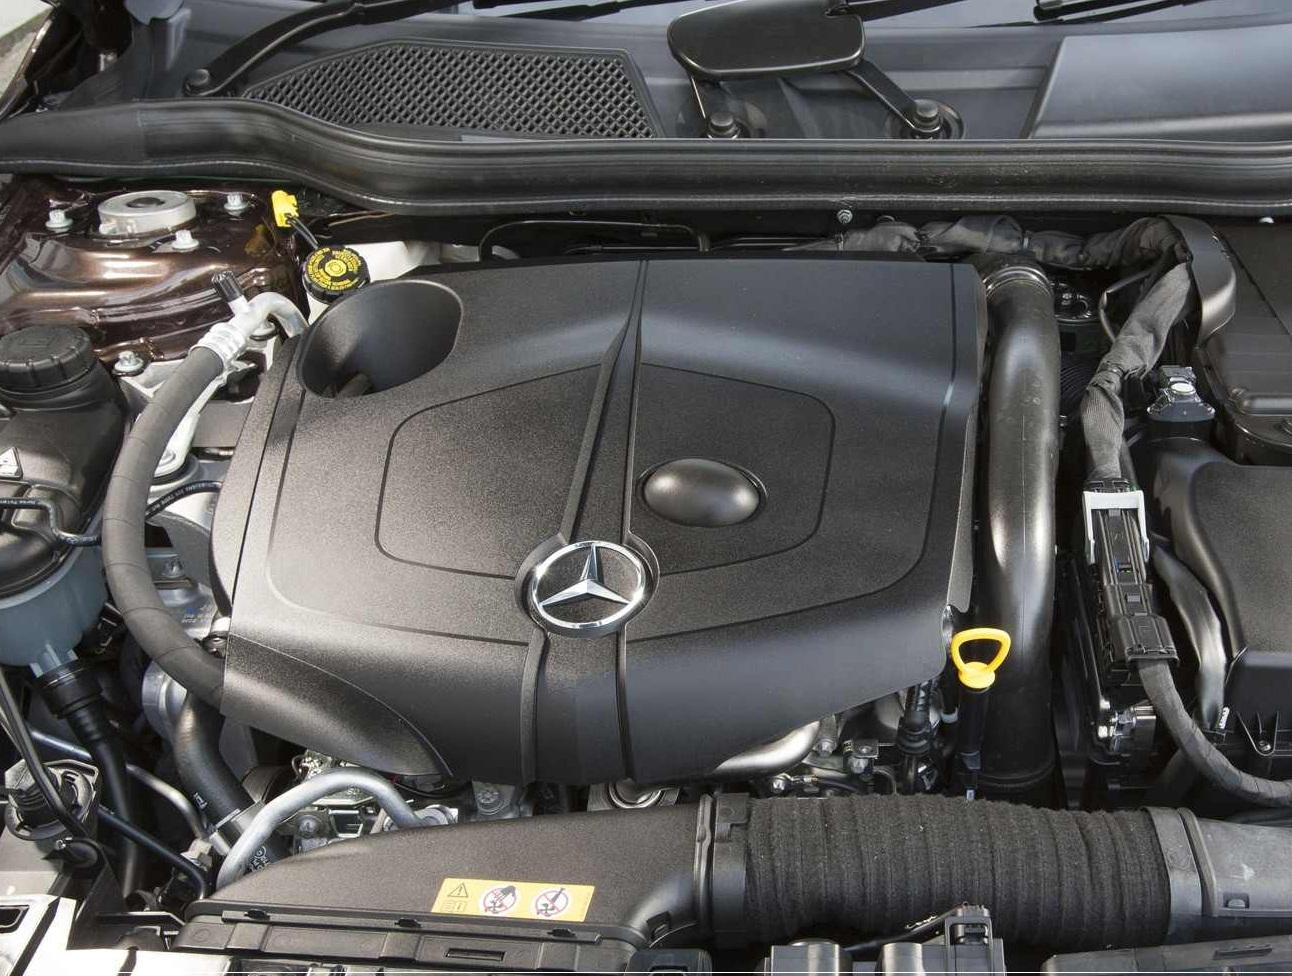 2018 Mercedes-Benz GLA-Class engine